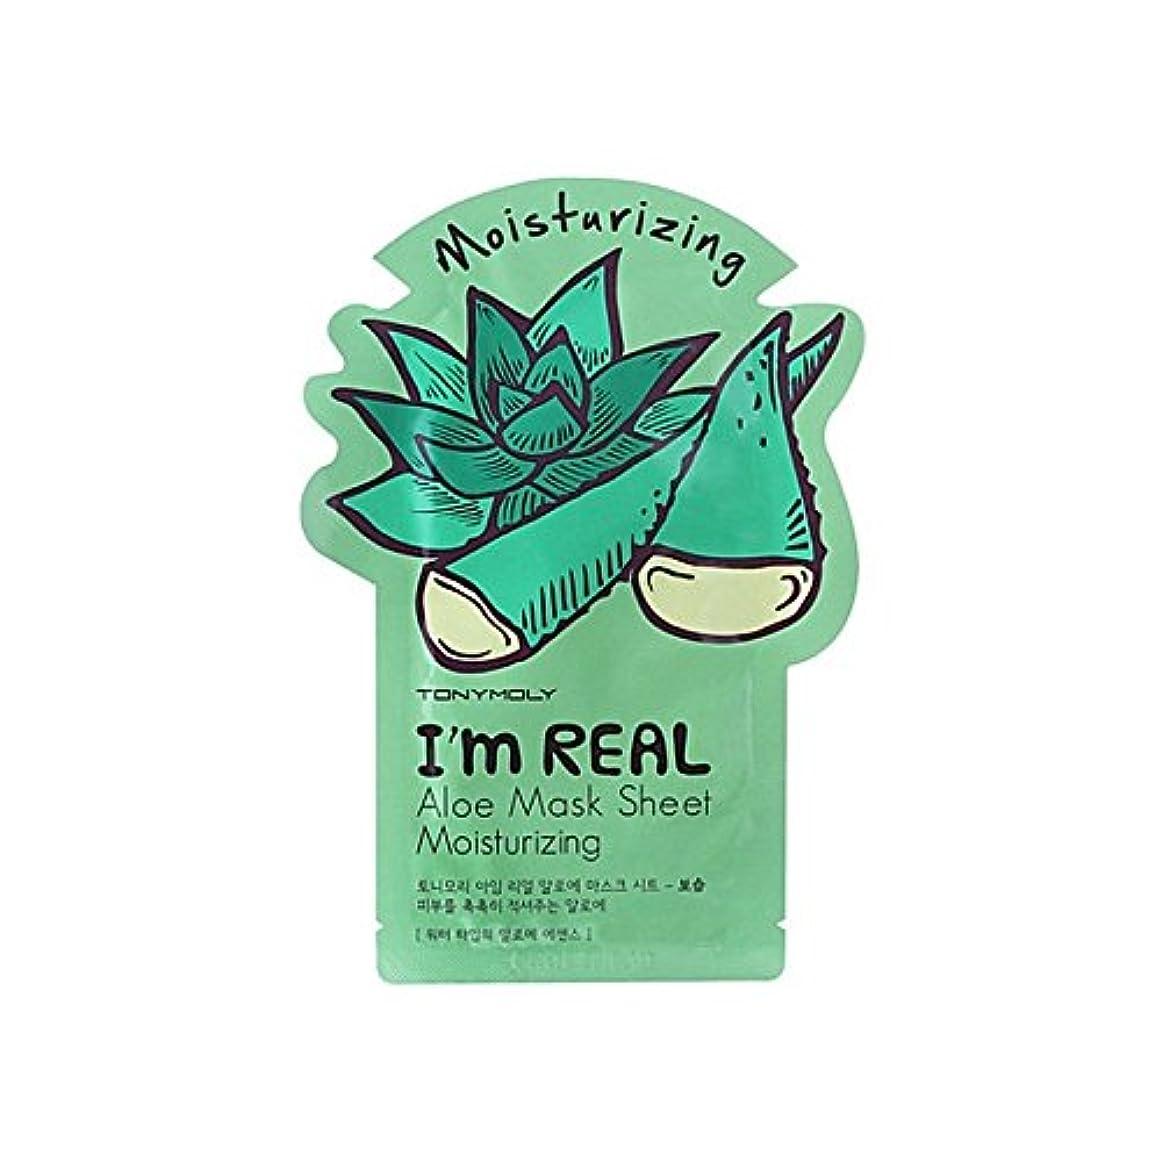 Tony Moly I'M Real Moisturising Aloe Face Mask - トニーモリー私は本当の保湿アロエフェイスマスクです [並行輸入品]